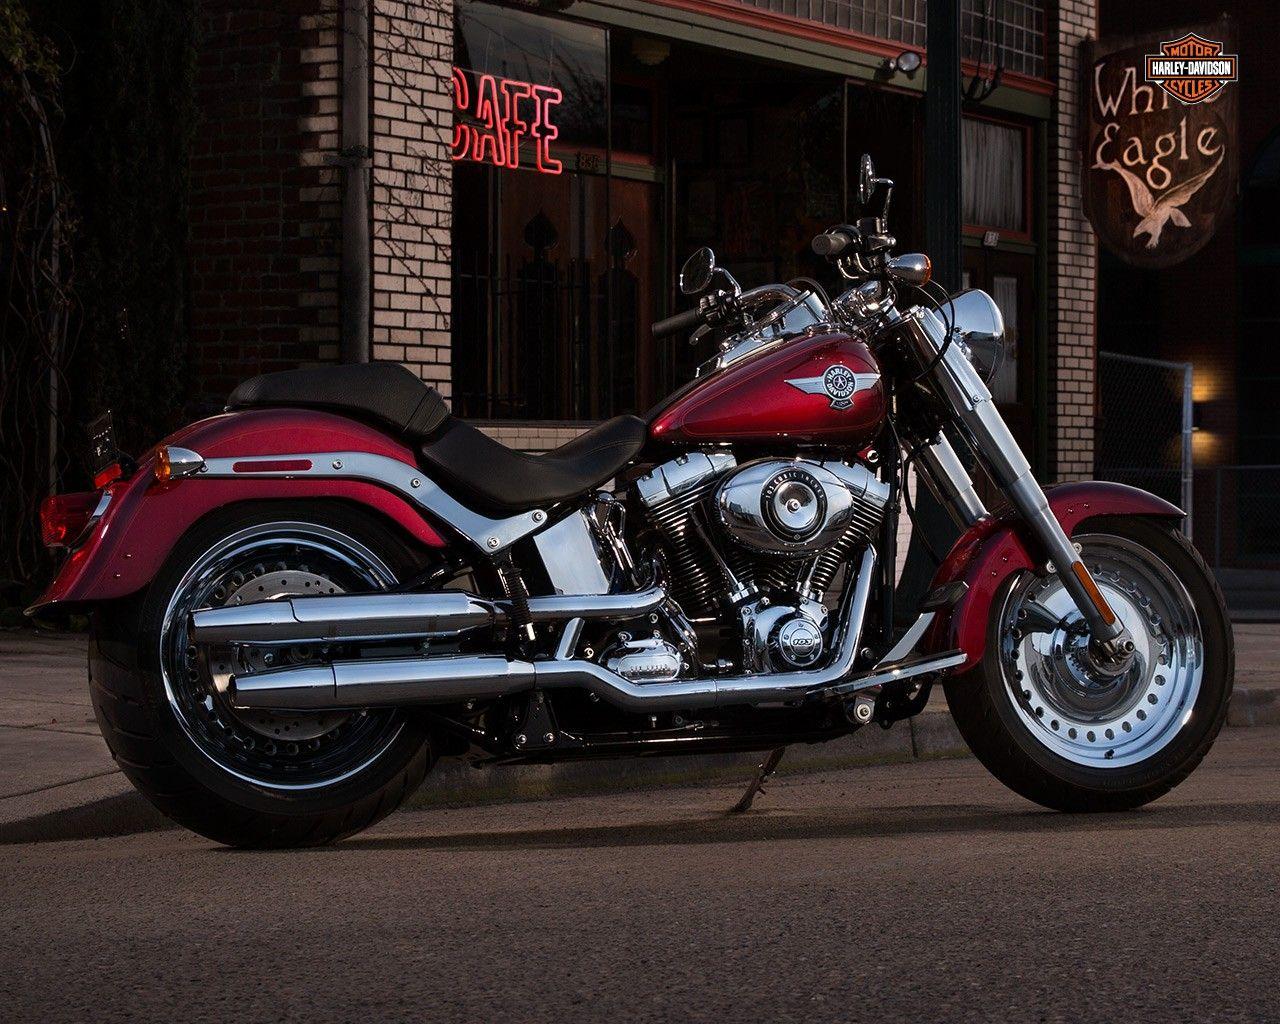 166 Best Images About Harley Davidson On Pinterest: Best 25+ Harley Davidson Fatboy Ideas On Pinterest